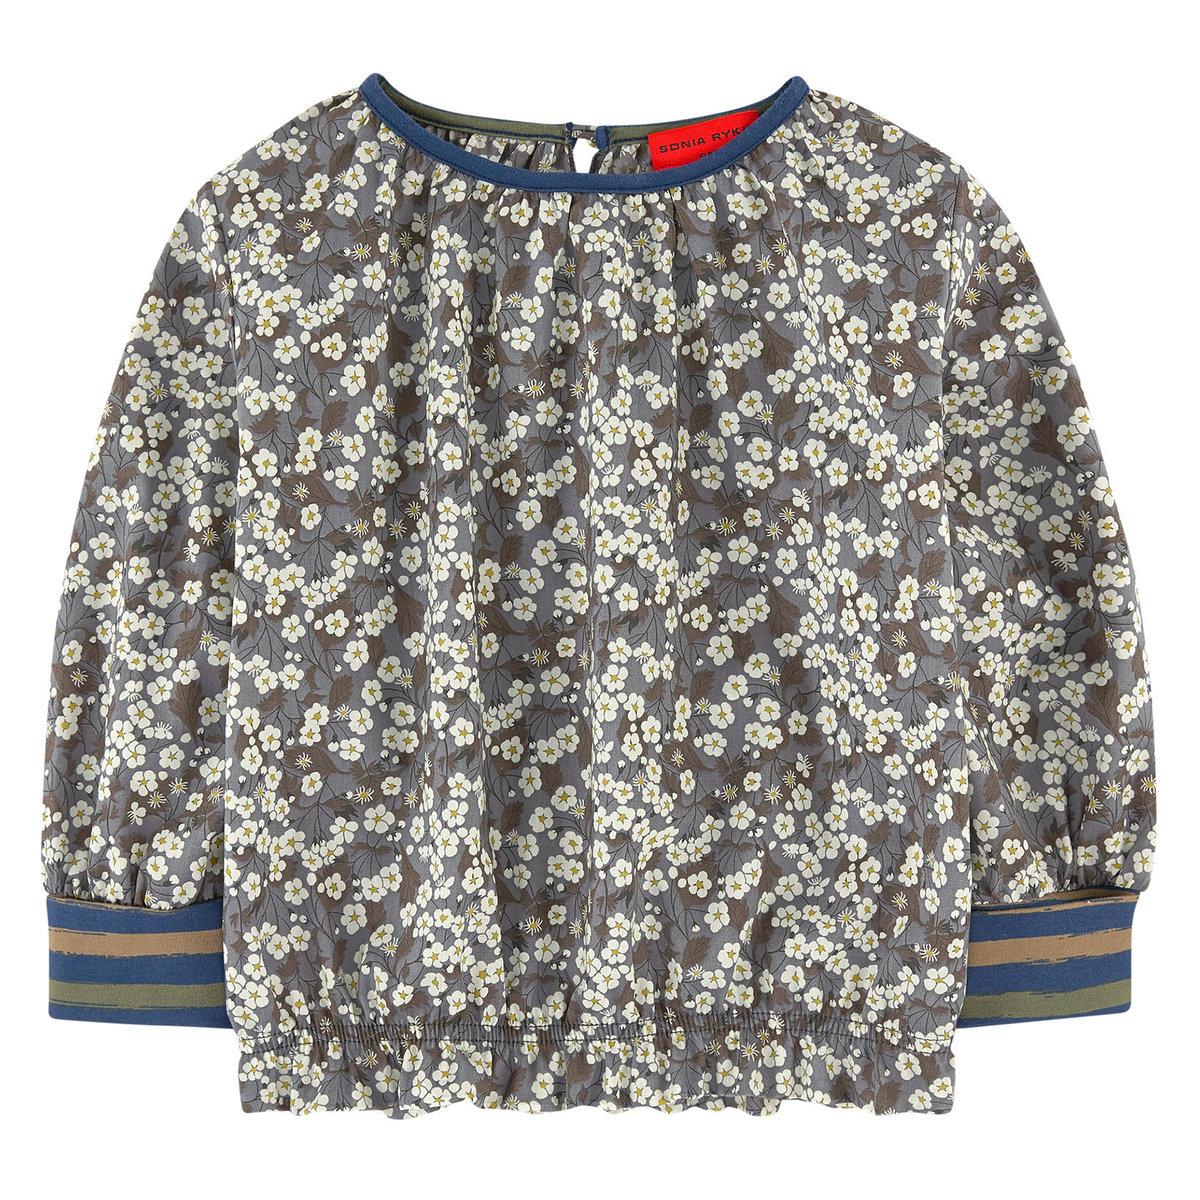 khaki liberty print blouse sonia rykiel enfant t shirts blouses tops angelibebe. Black Bedroom Furniture Sets. Home Design Ideas